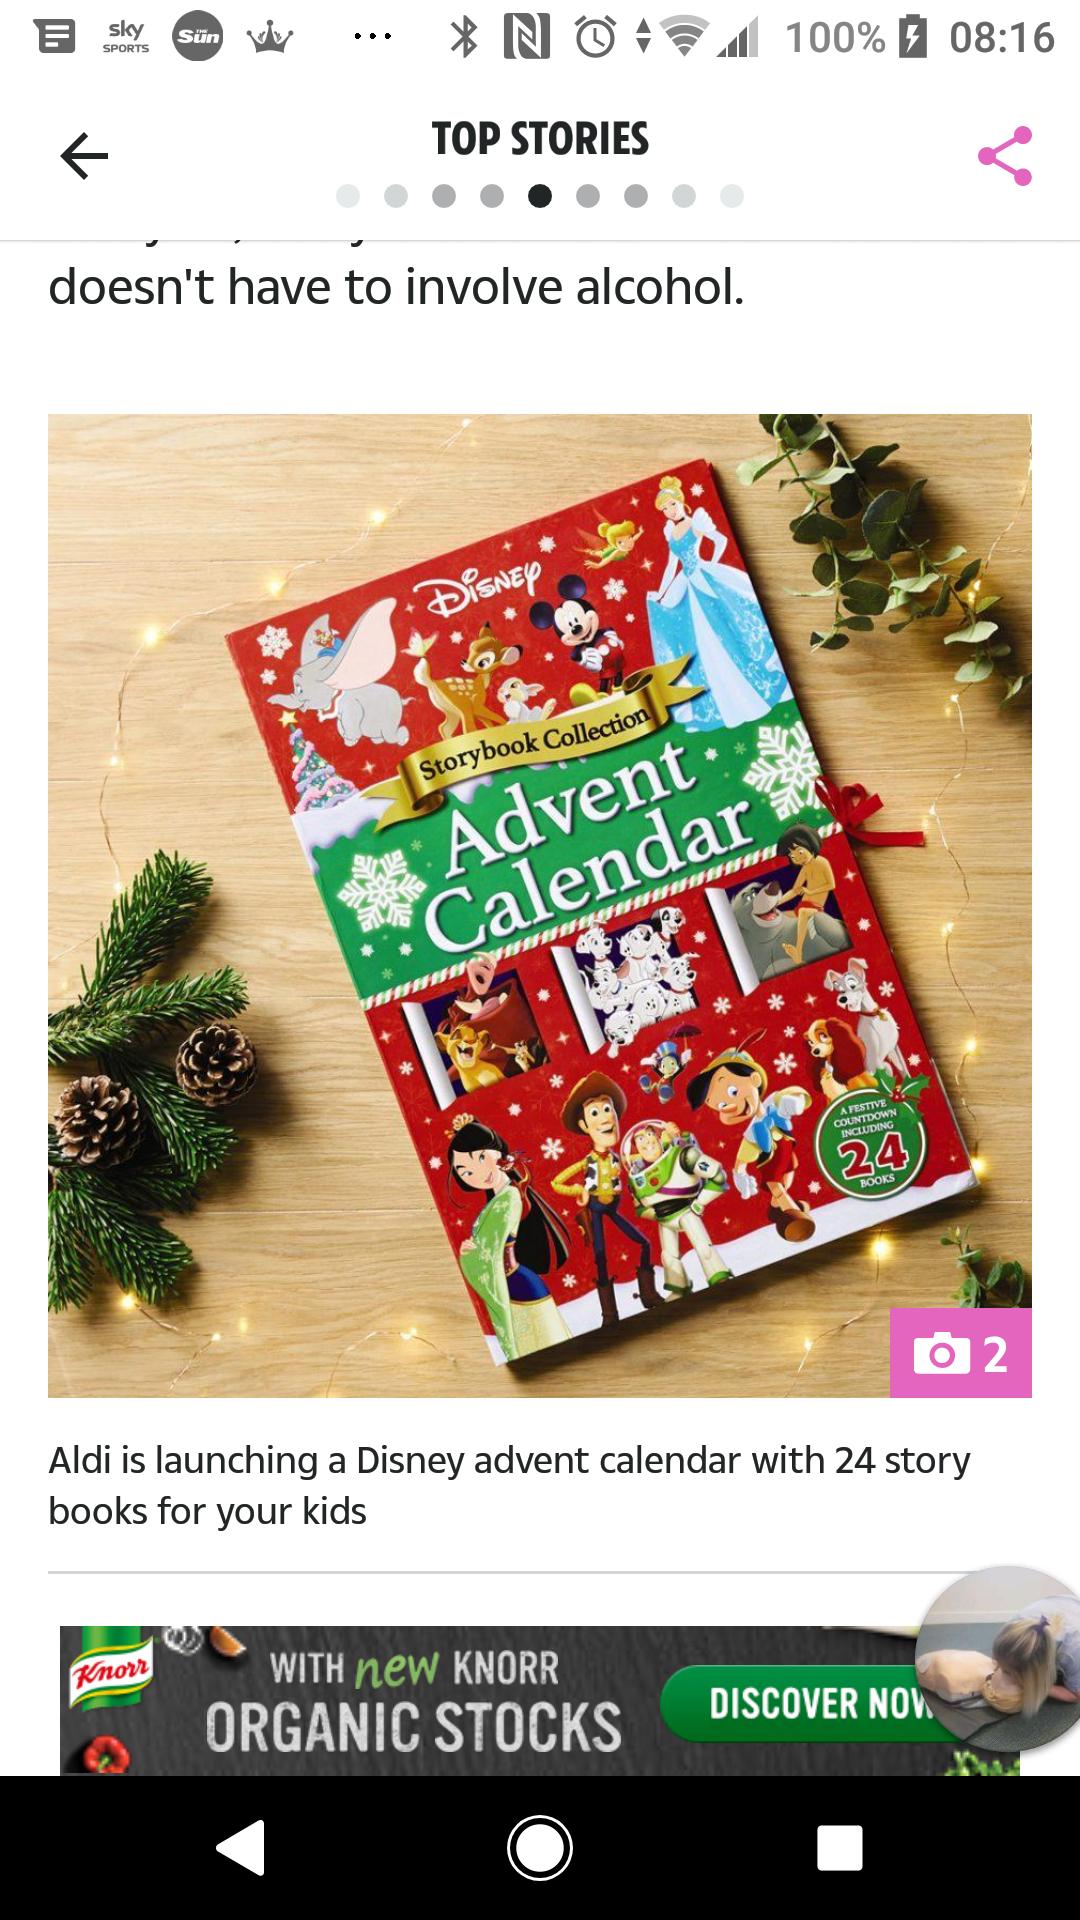 Disney advent calendar 24 books at Aldi for £9.99